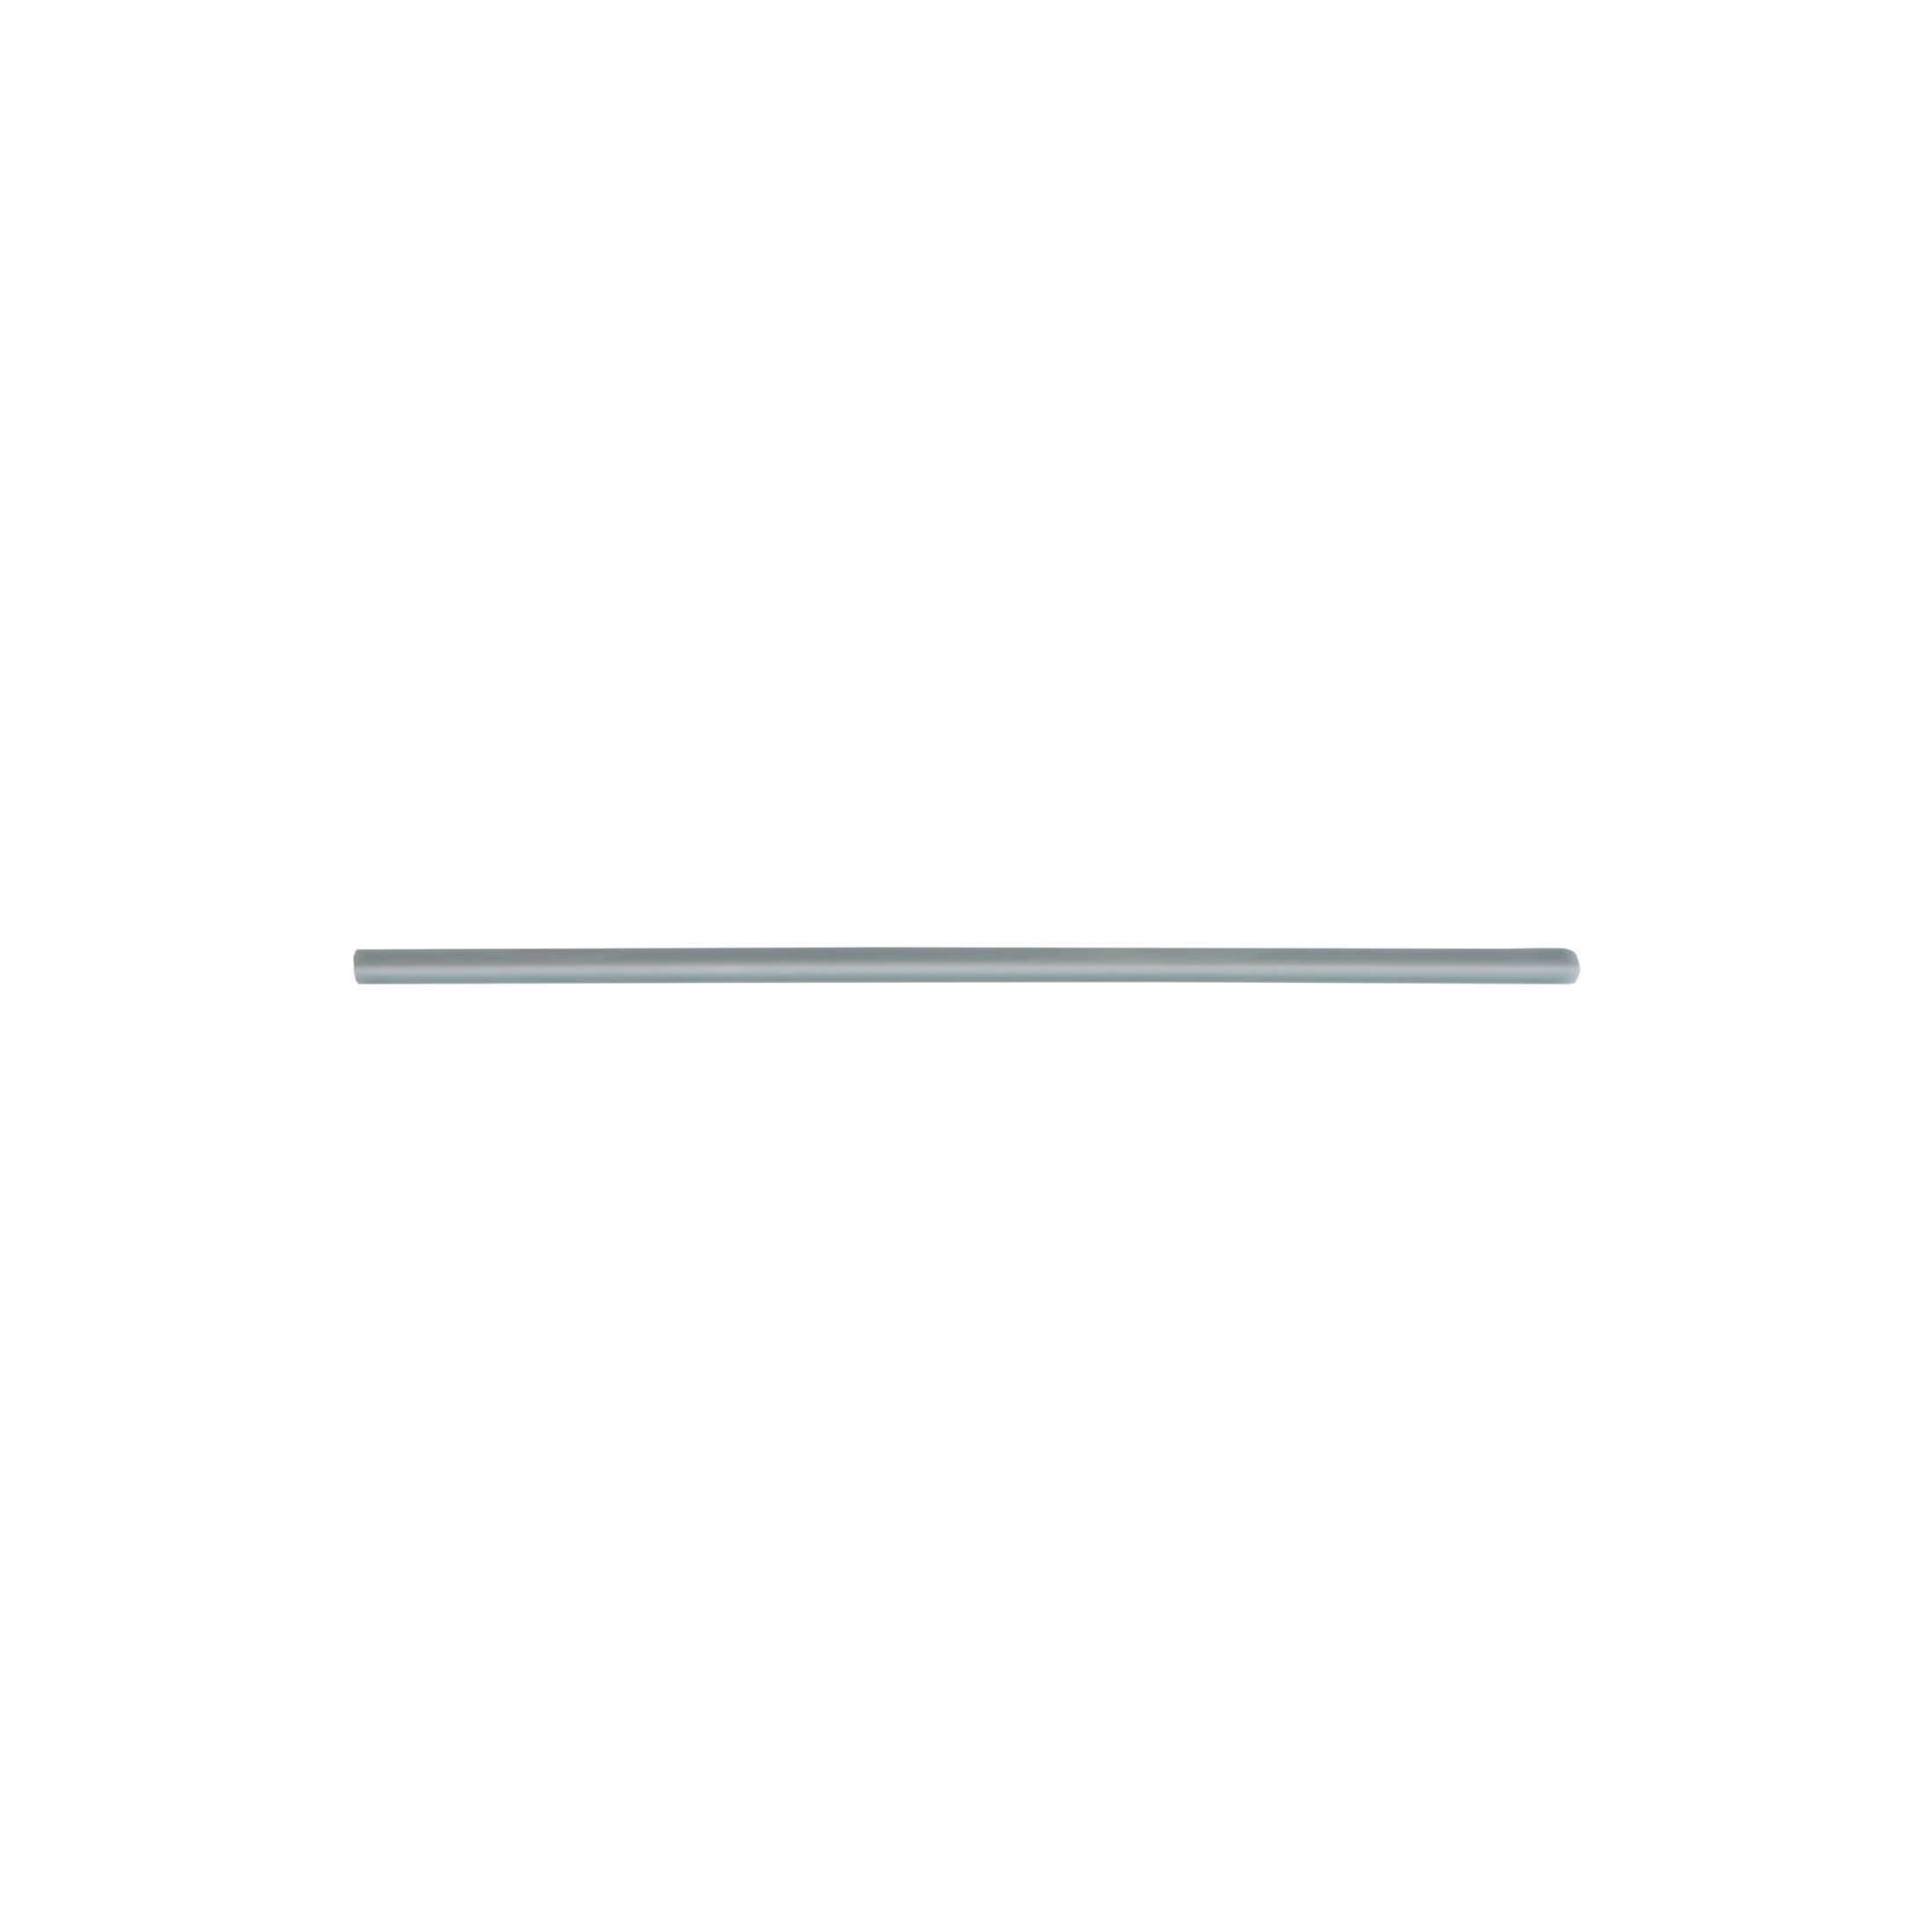 ADNE5636 - BULLNOSE TRIM - 0.85 cm X 20 cm